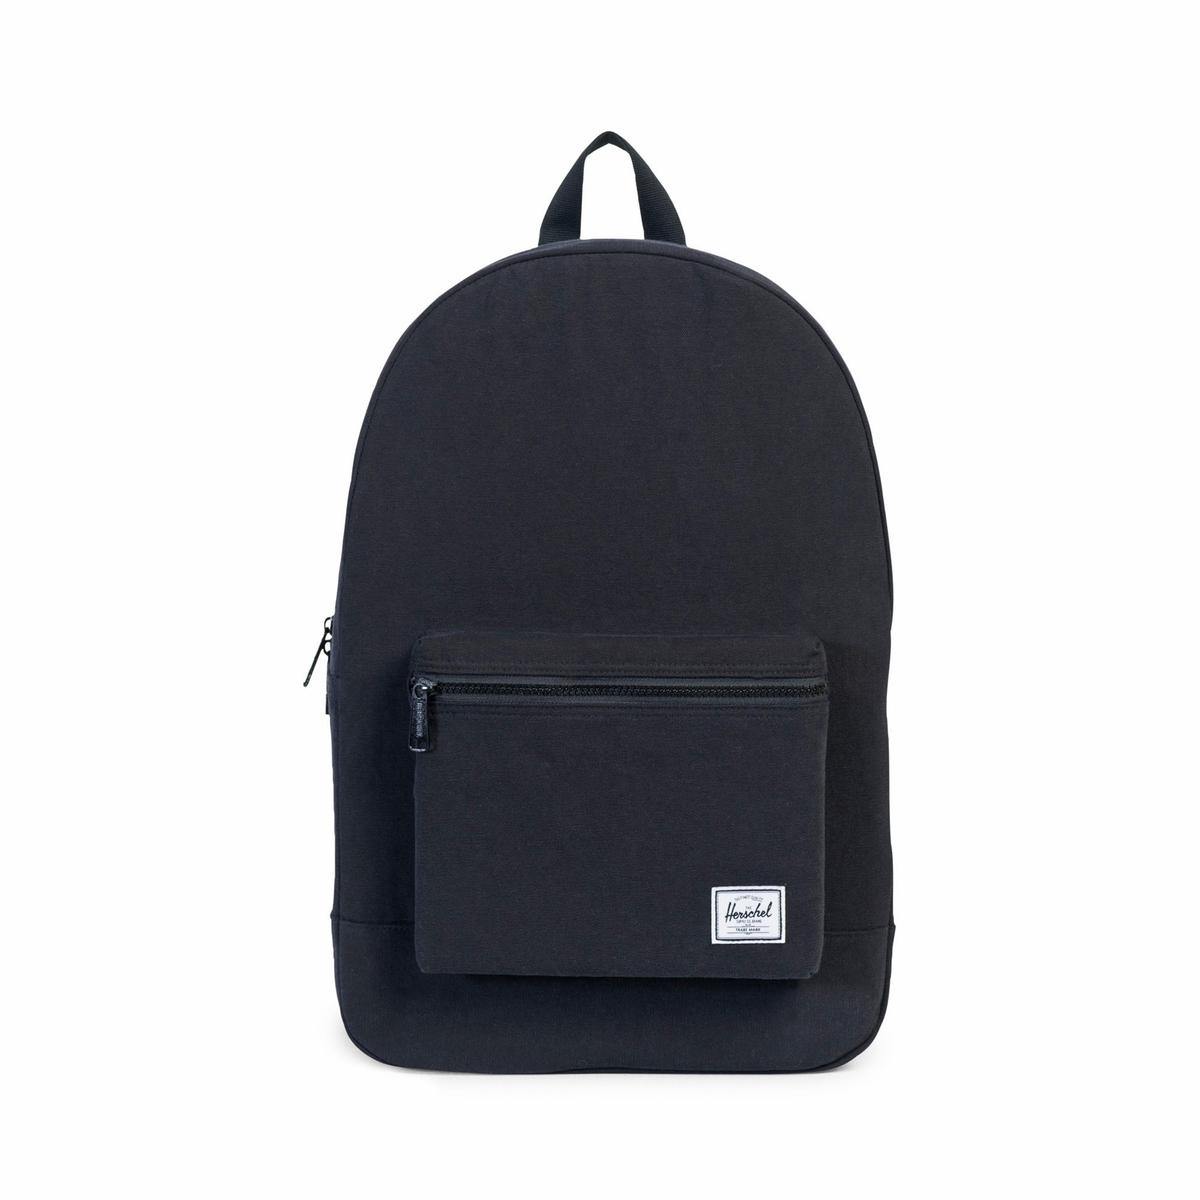 Рюкзак однотонный DAYPACK 24.5L рюкзак arcteryx 14467 astri 19 daypack